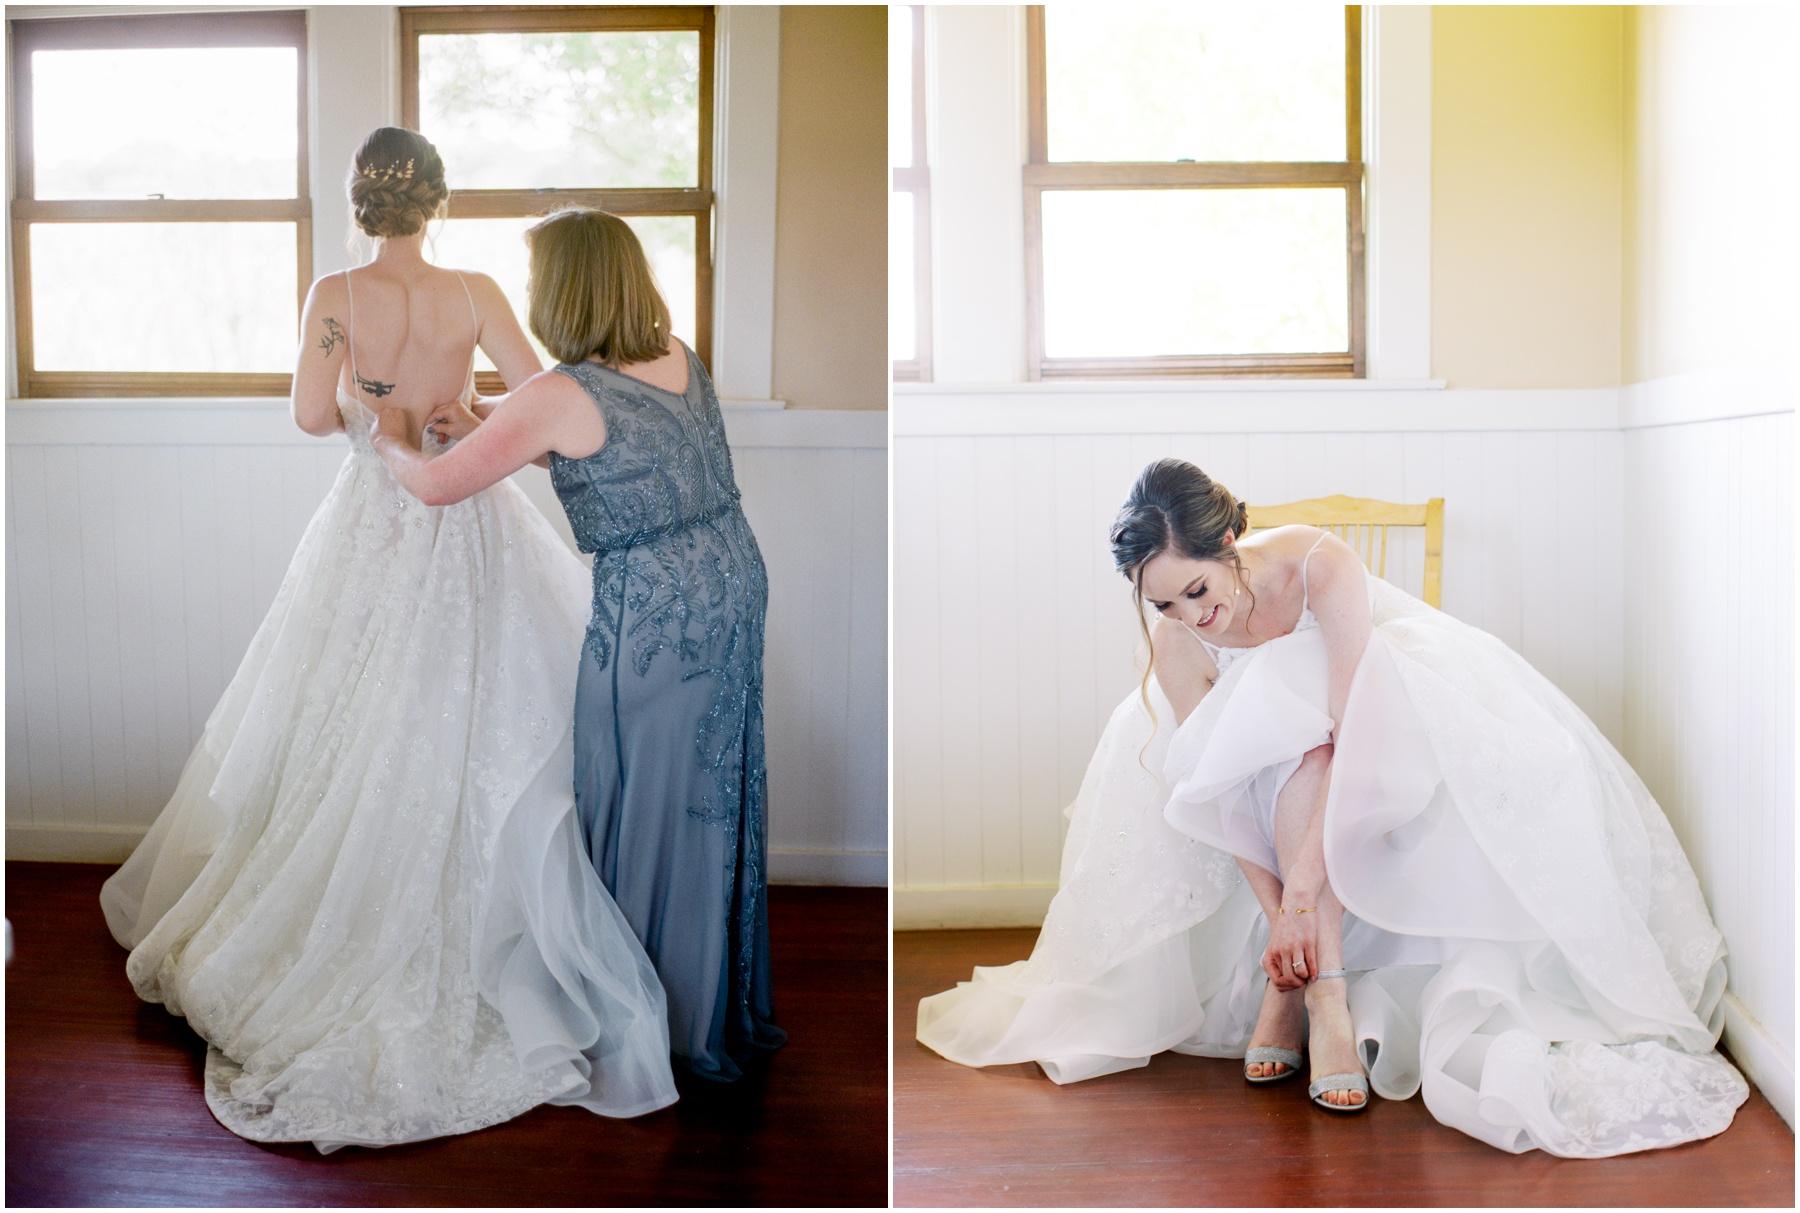 Scribner-bend-vineyards-wedding-sacramento-california-Kristine-Herman-Photography-8.jpg